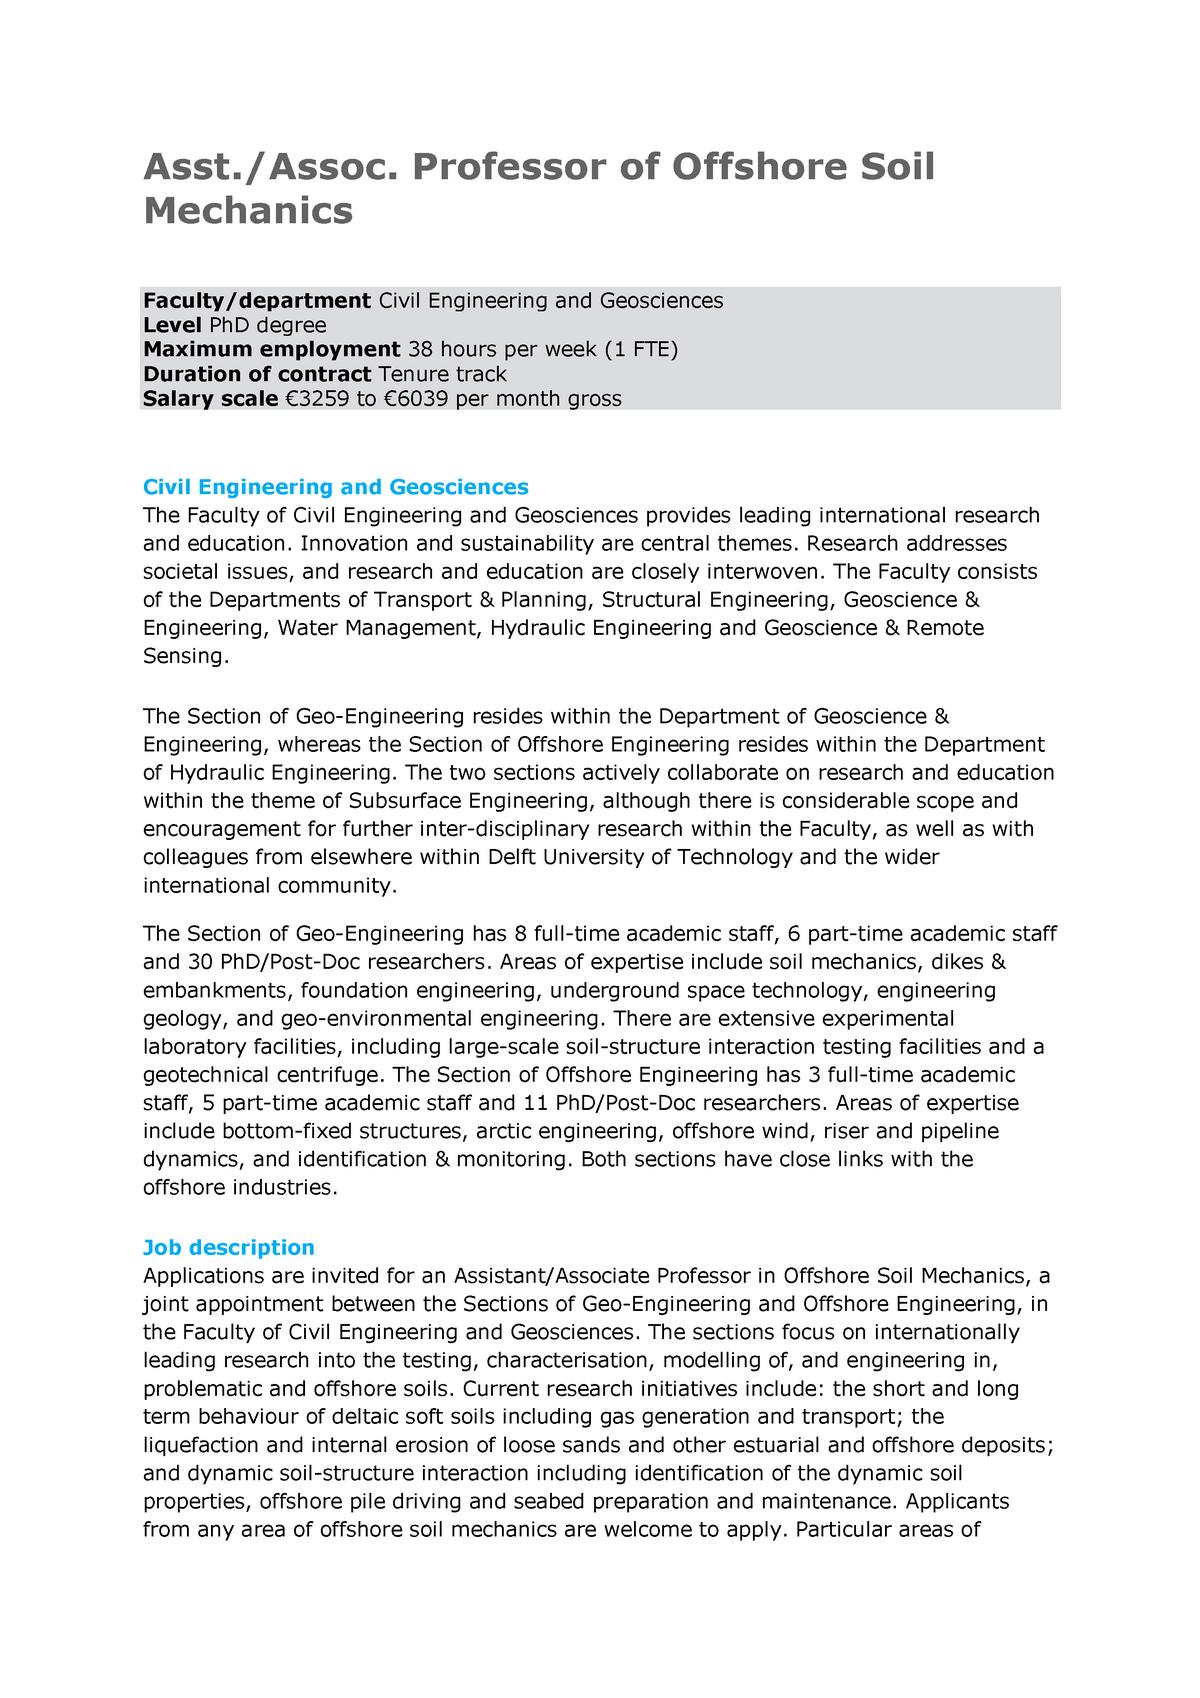 Offshore Soil Mechanics Version 7 - Petroleum engineering